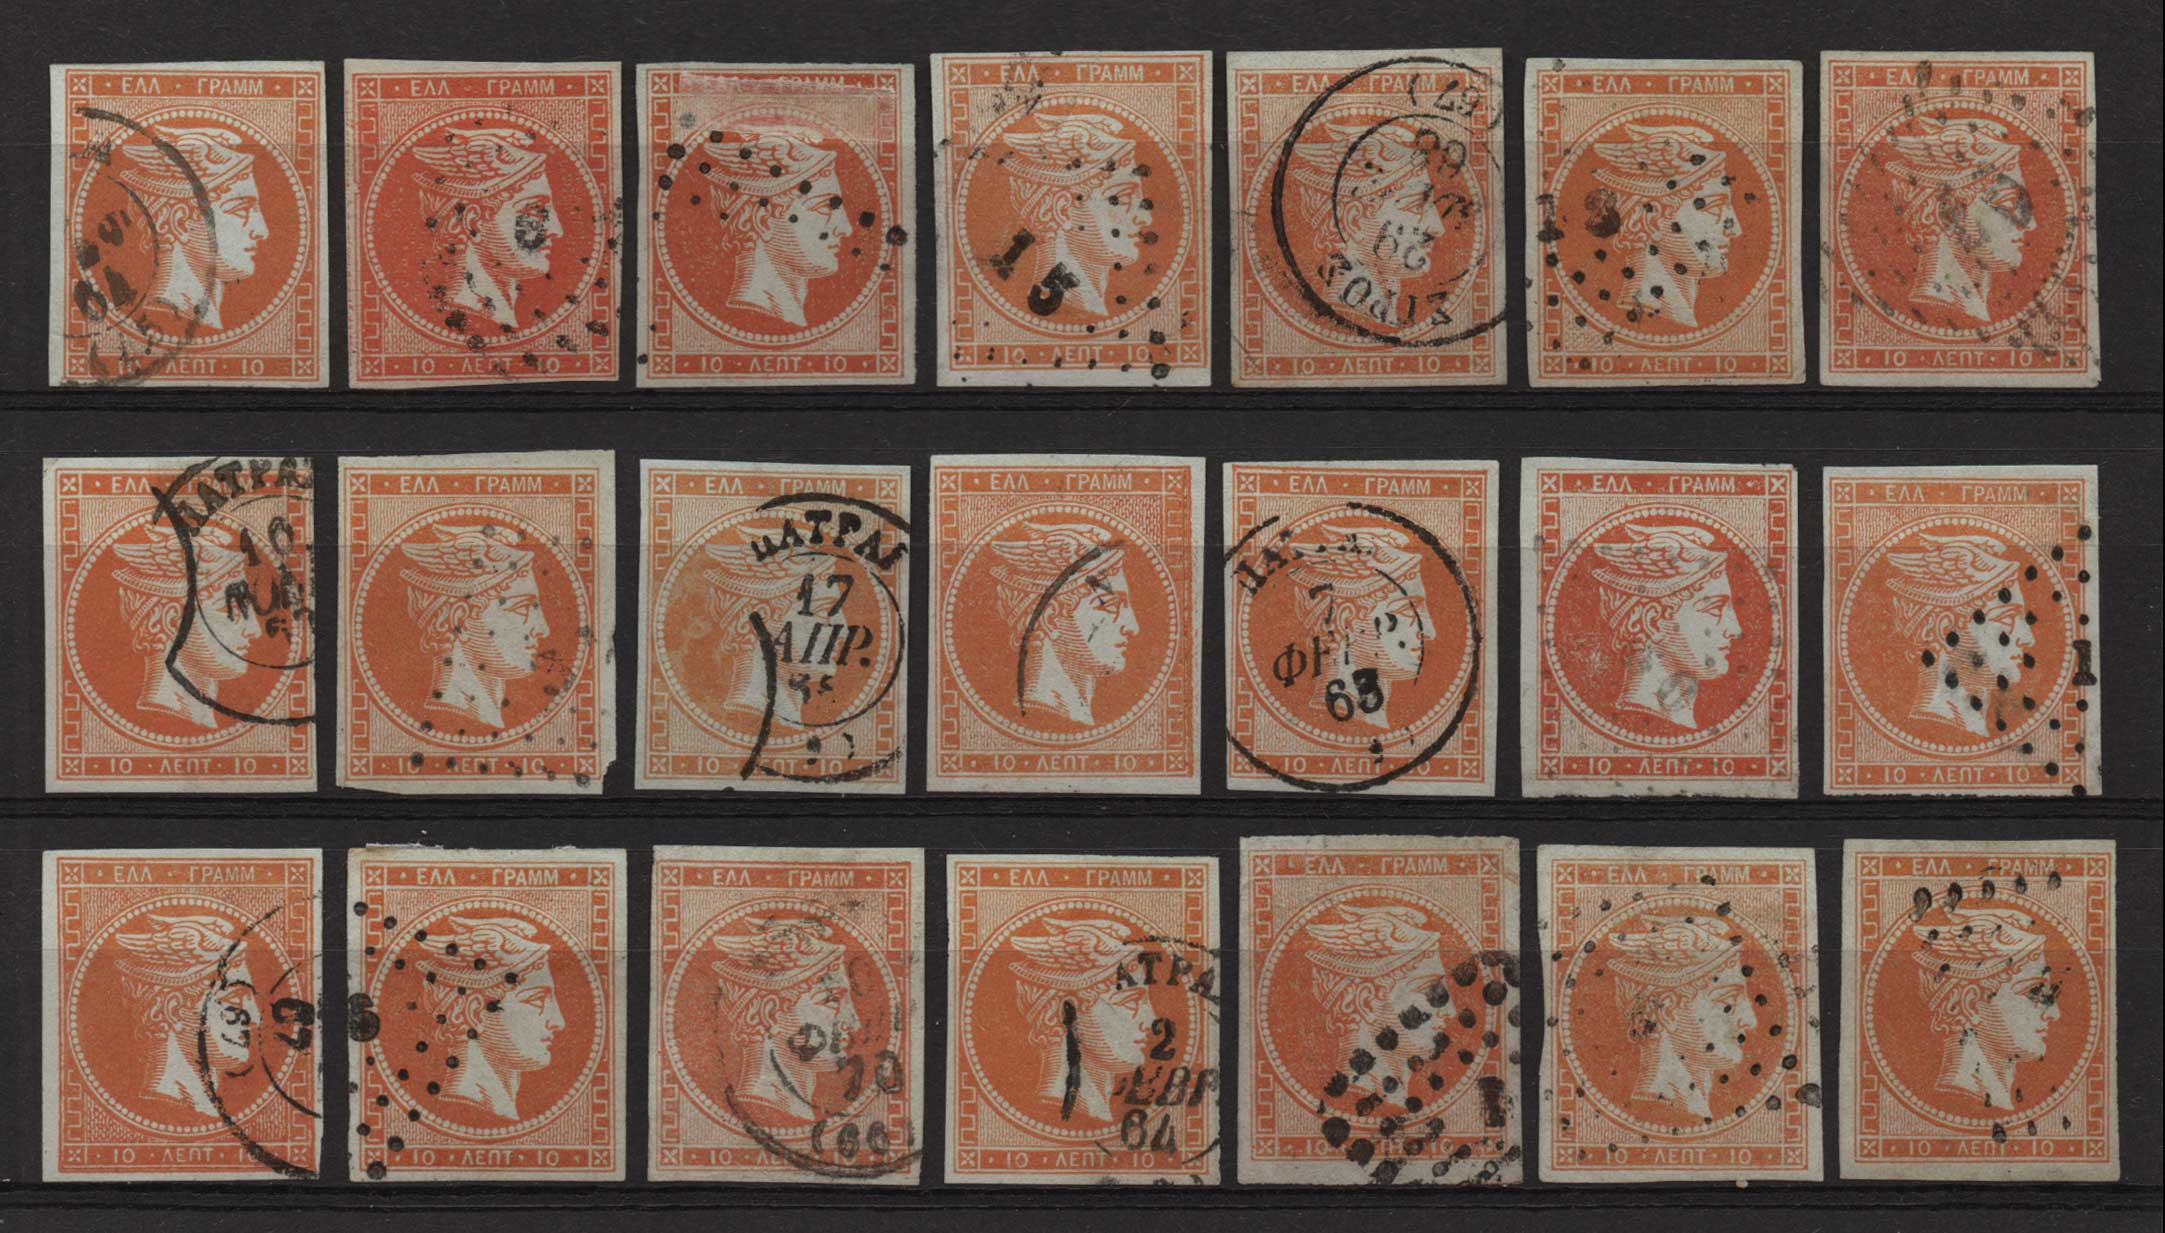 Lot 8 - -  LARGE HERMES HEAD large hermes head -  Athens Auctions Public Auction 70 General Stamp Sale